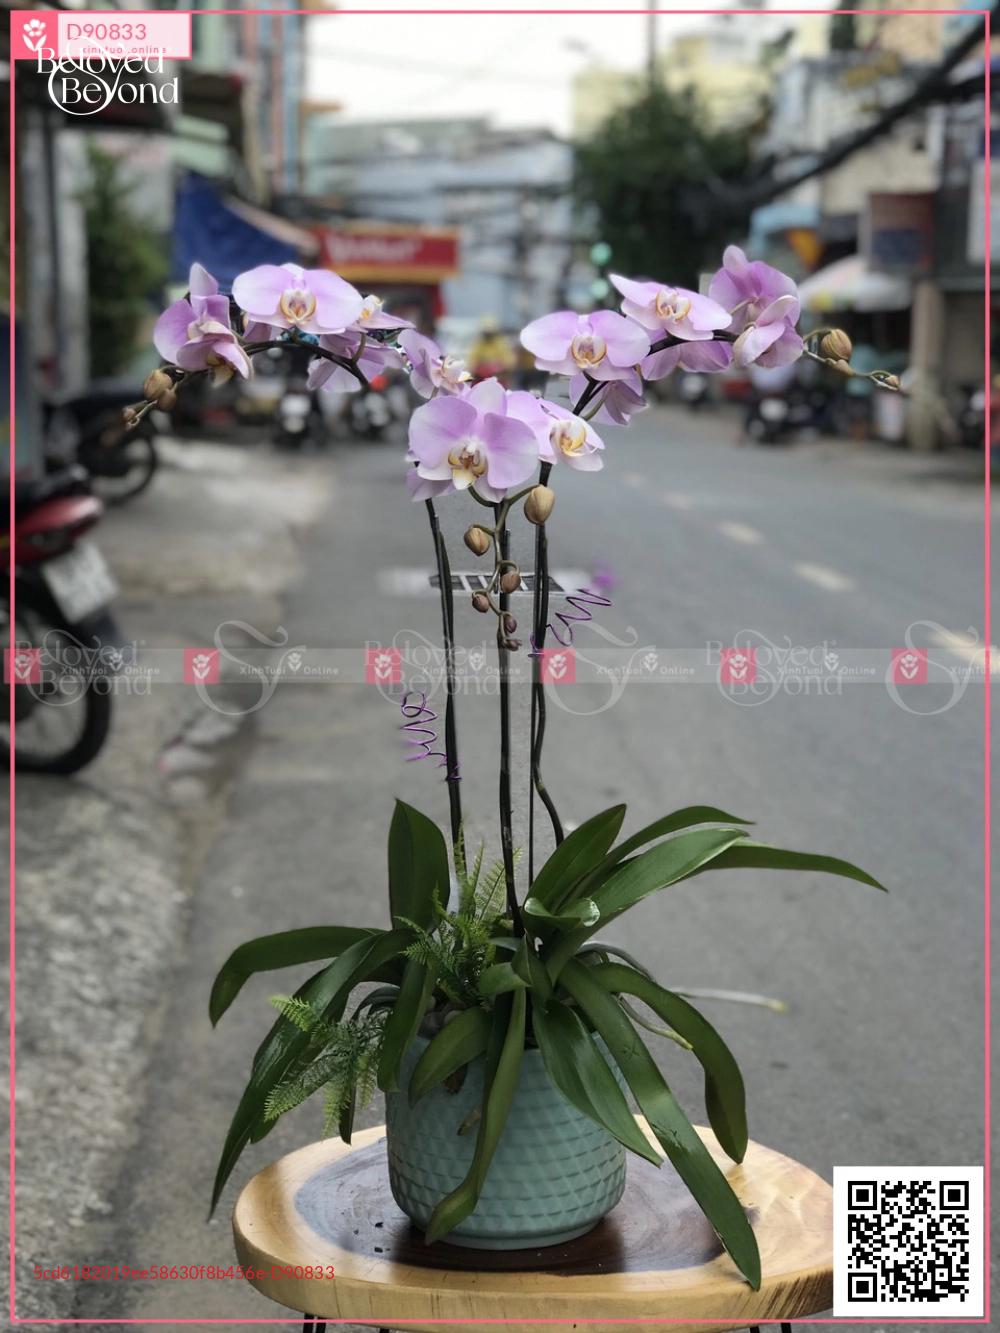 Vĩnh Cửu - D90833 - xinhtuoi.online